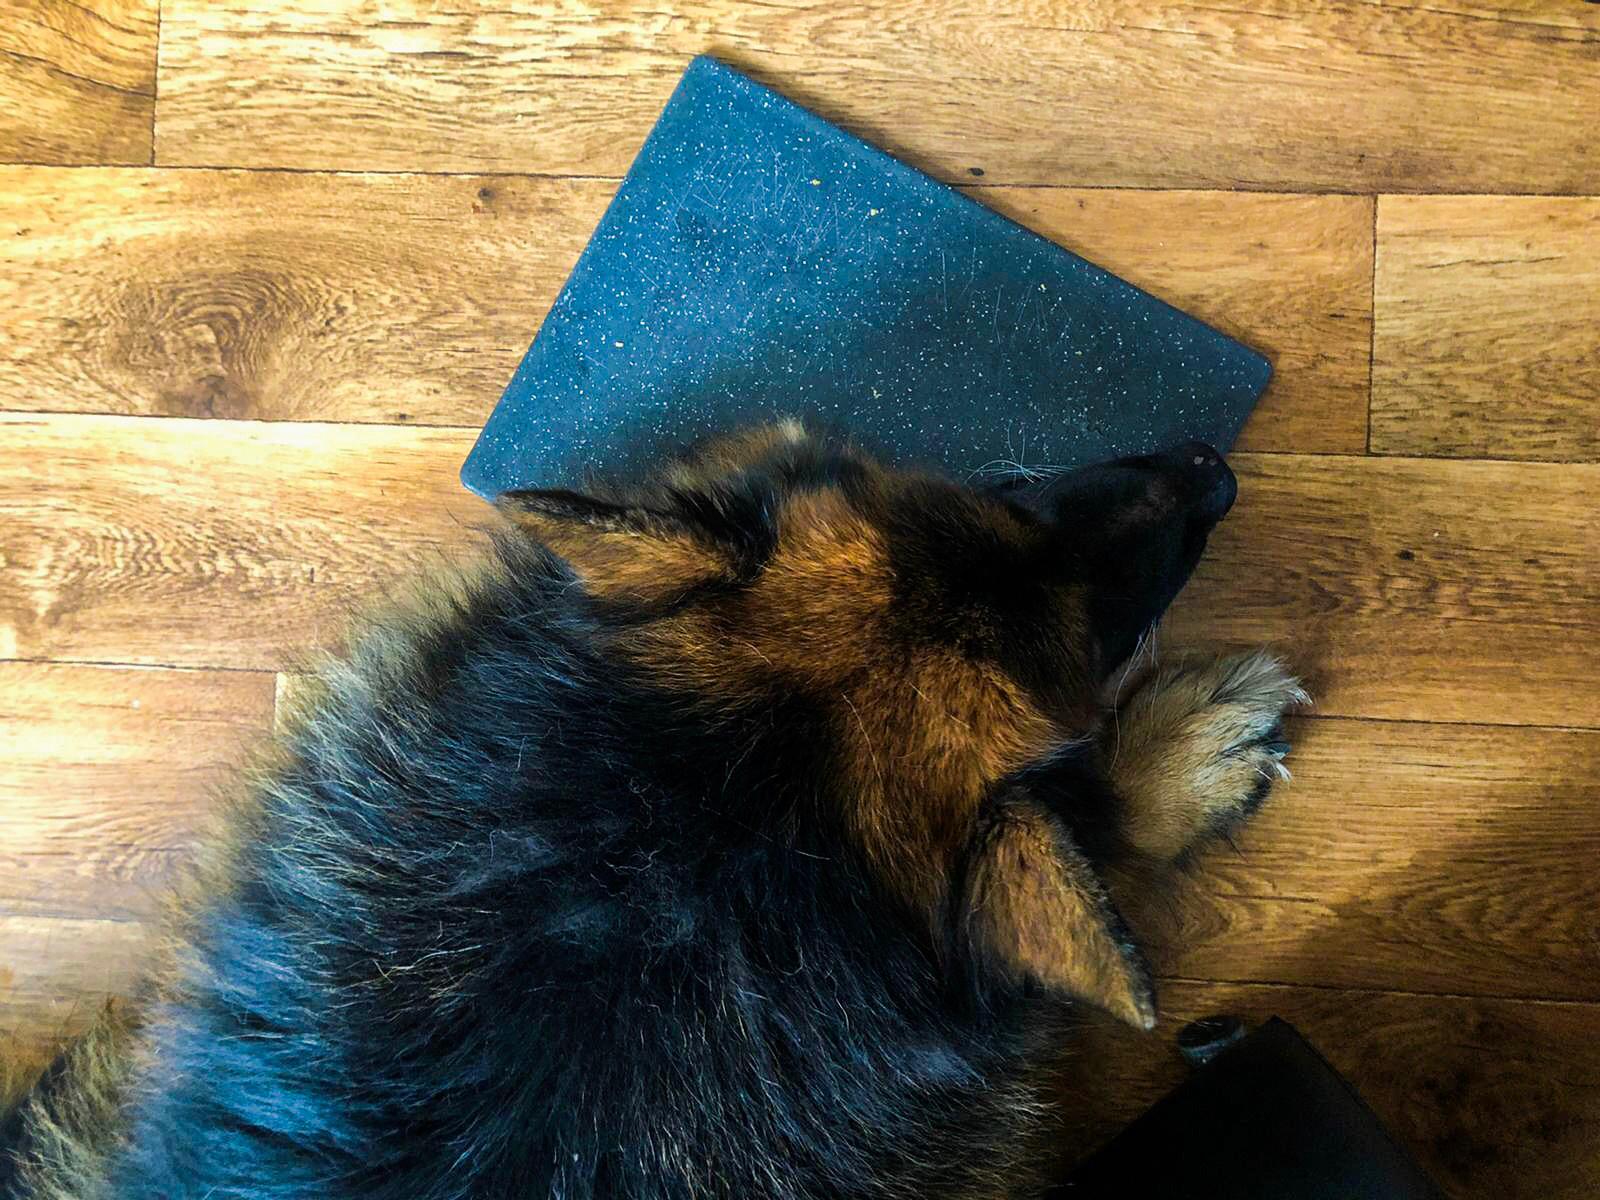 Hond in slaap gevallen op broodplank